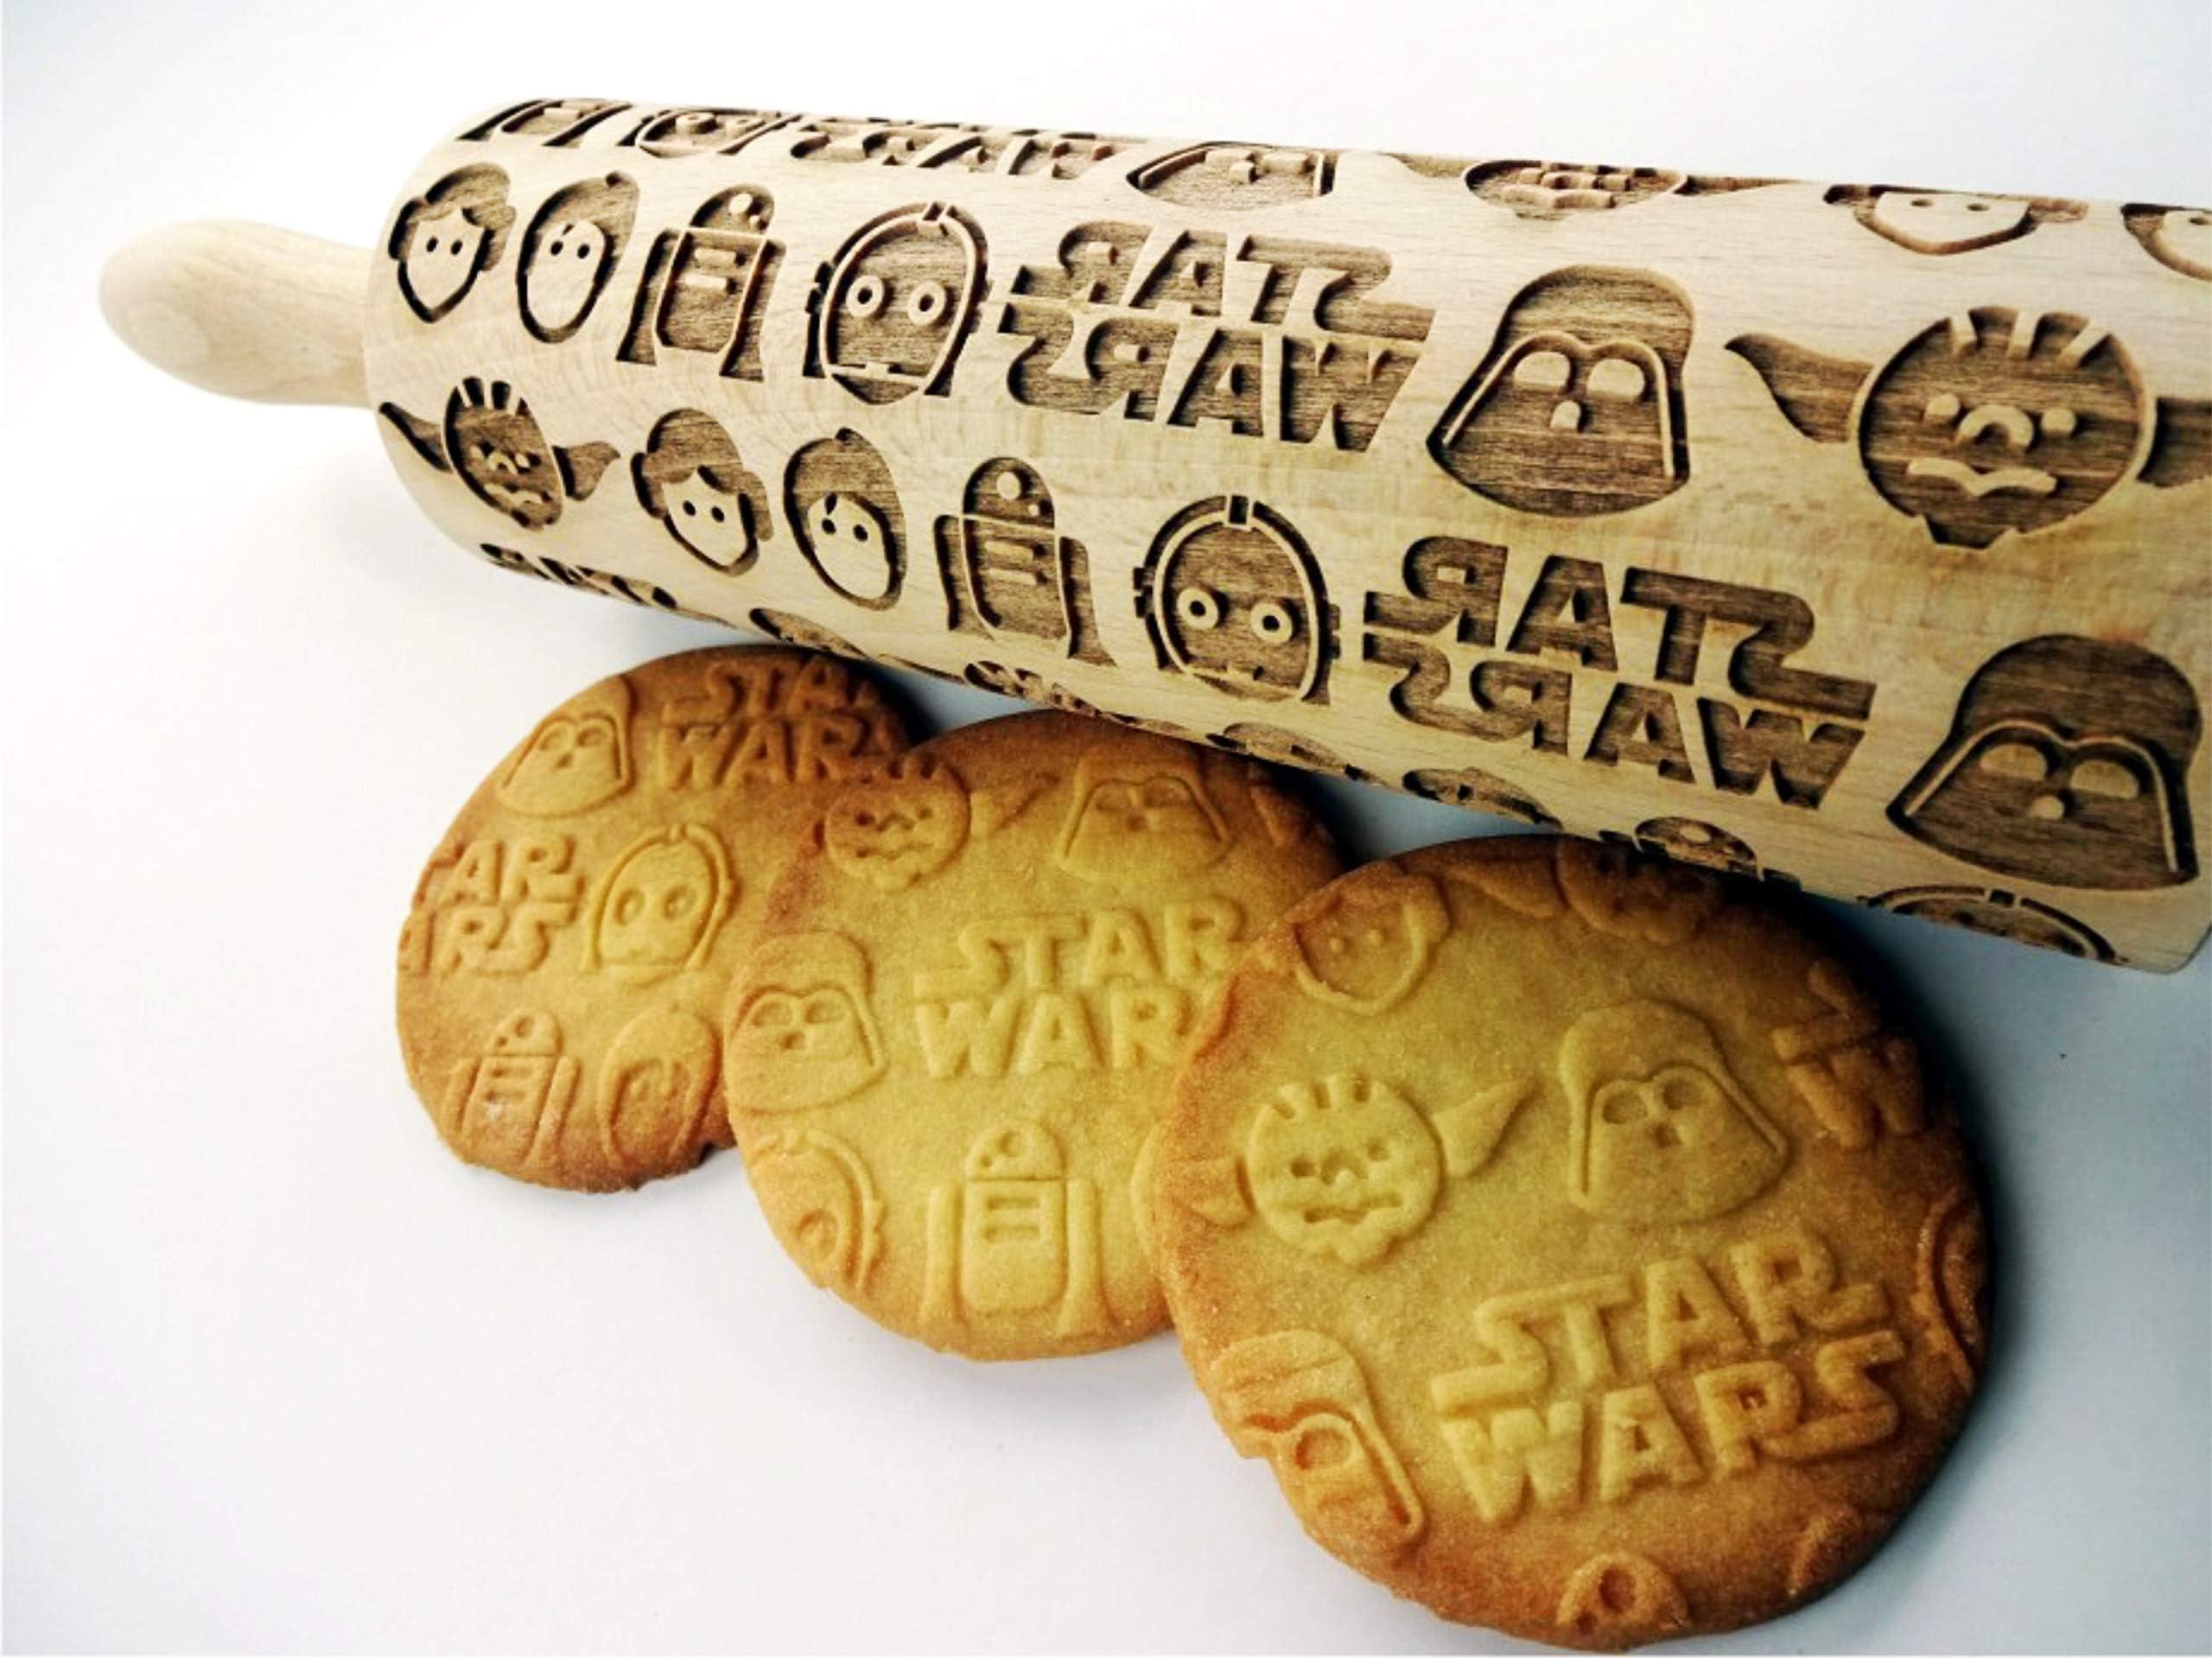 Darth Vader Christmas gift idea Yoda /& R2-D2 Star wars pattern Embossed Rolling Pin Star wars Engraved rolling-pin Star wars pattern